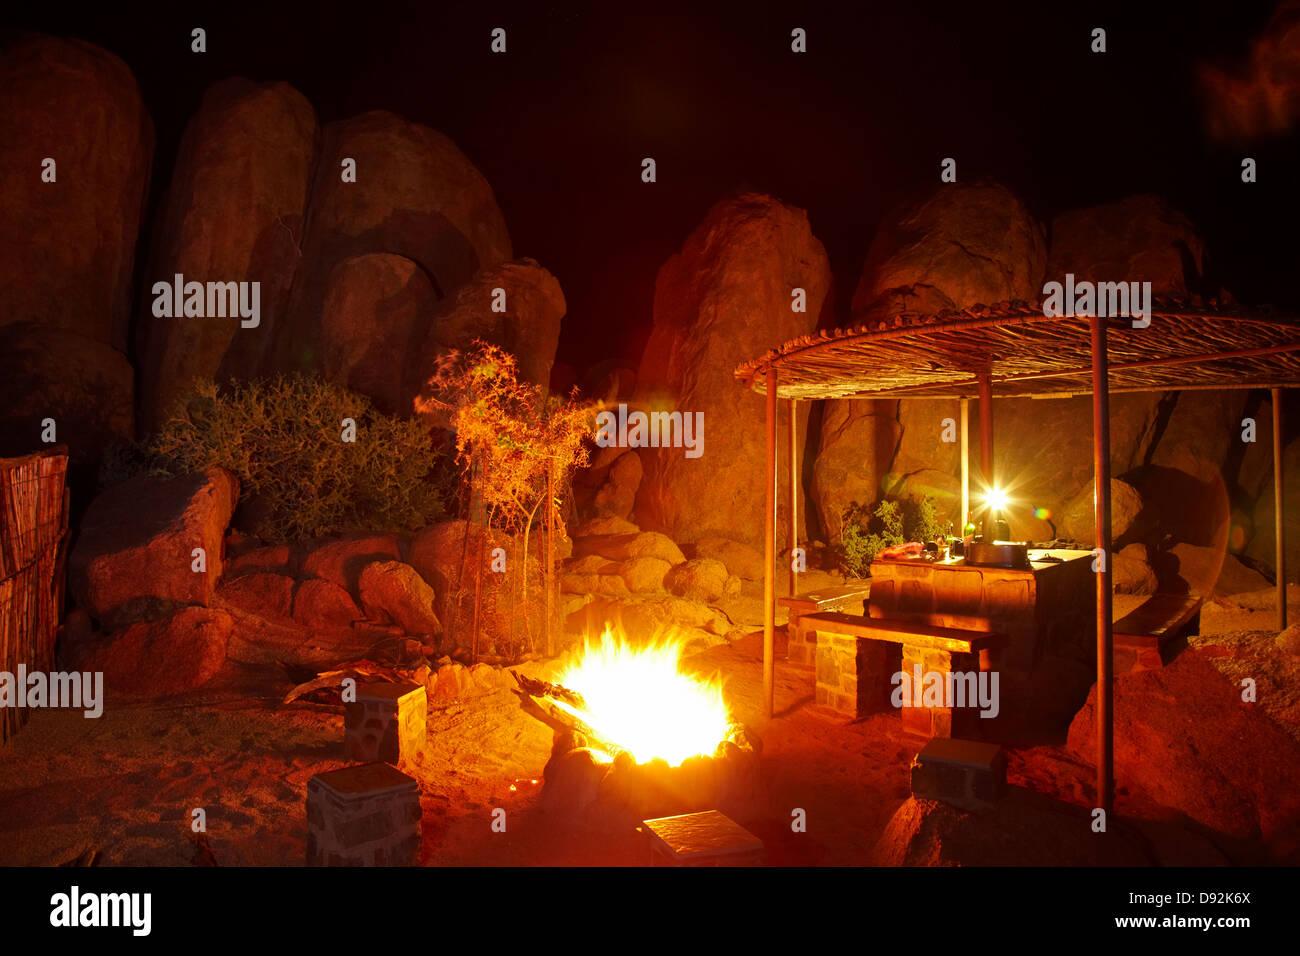 Campfire among the rocks, Ranch Koiimasis camp site, Tiras Mountains, Southern Namibia, Africa - Stock Image